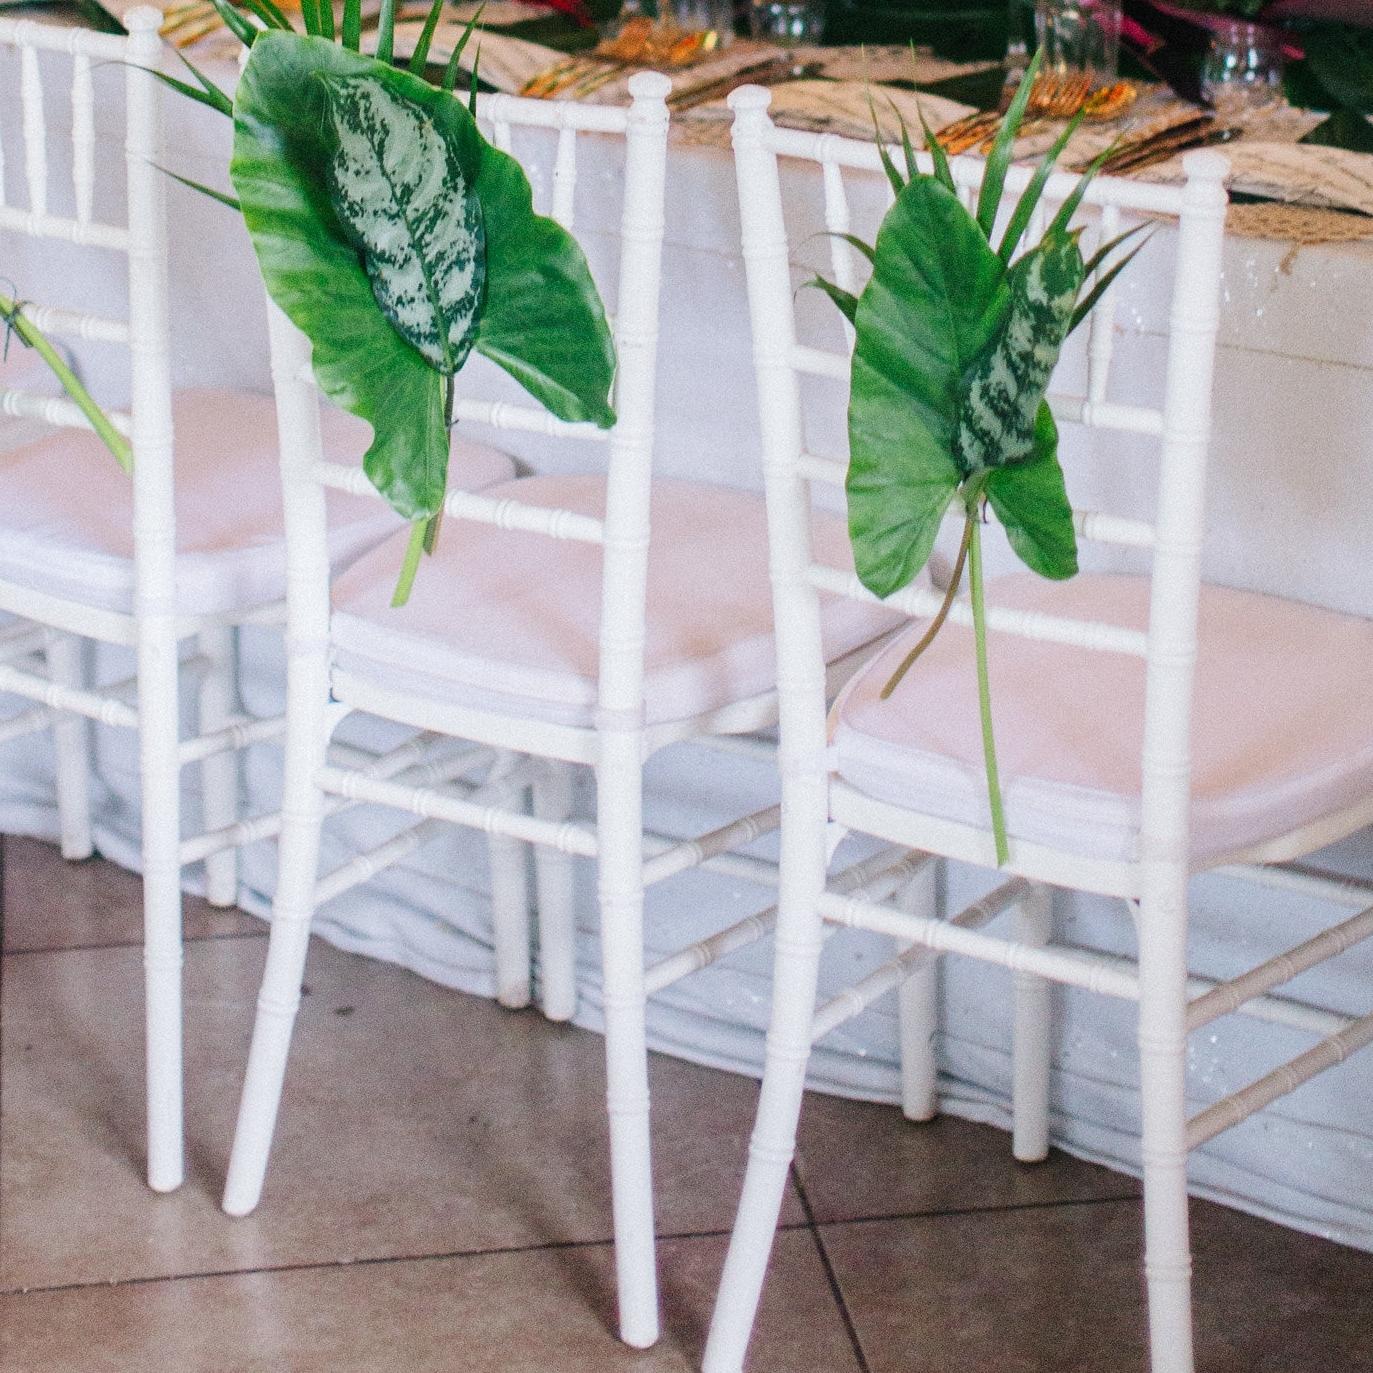 destination_fiji_wedding_white_tiffany_chair.jpg